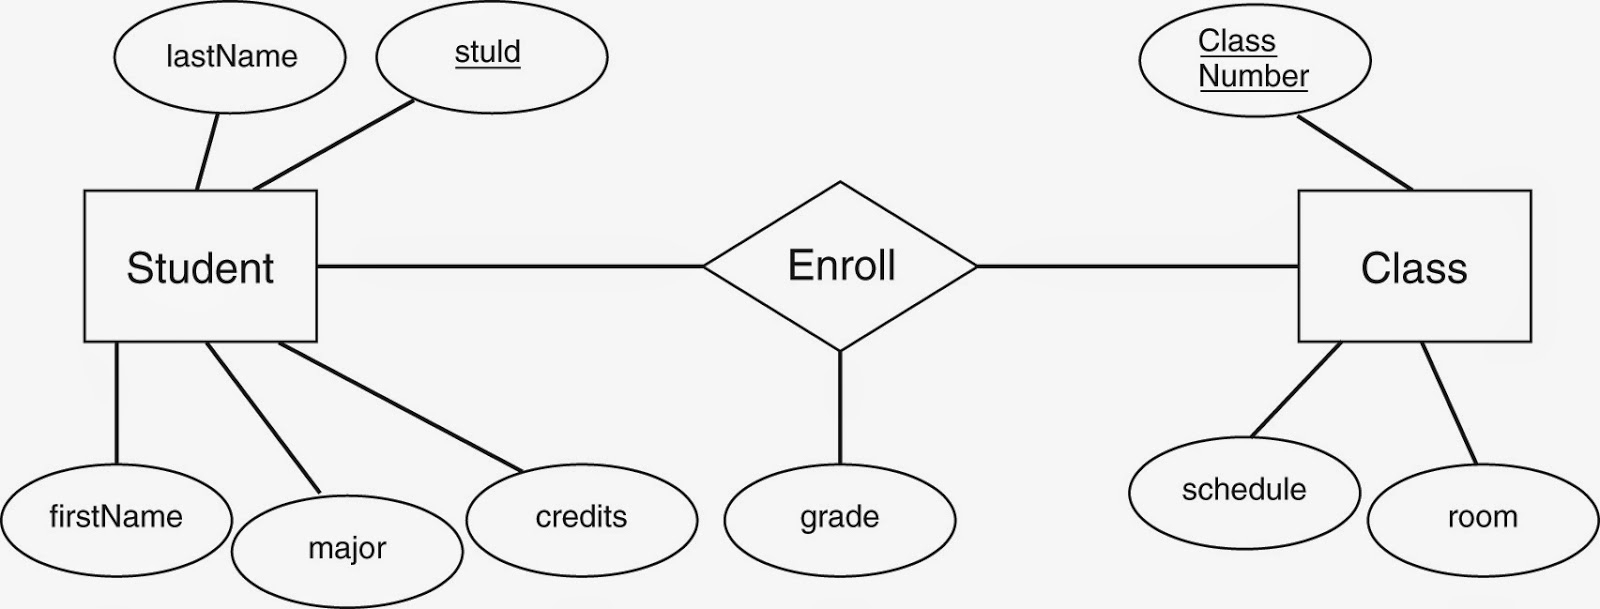 Relational Database Management System (Rdbms): Examples Of intended for Rdbms Diagram